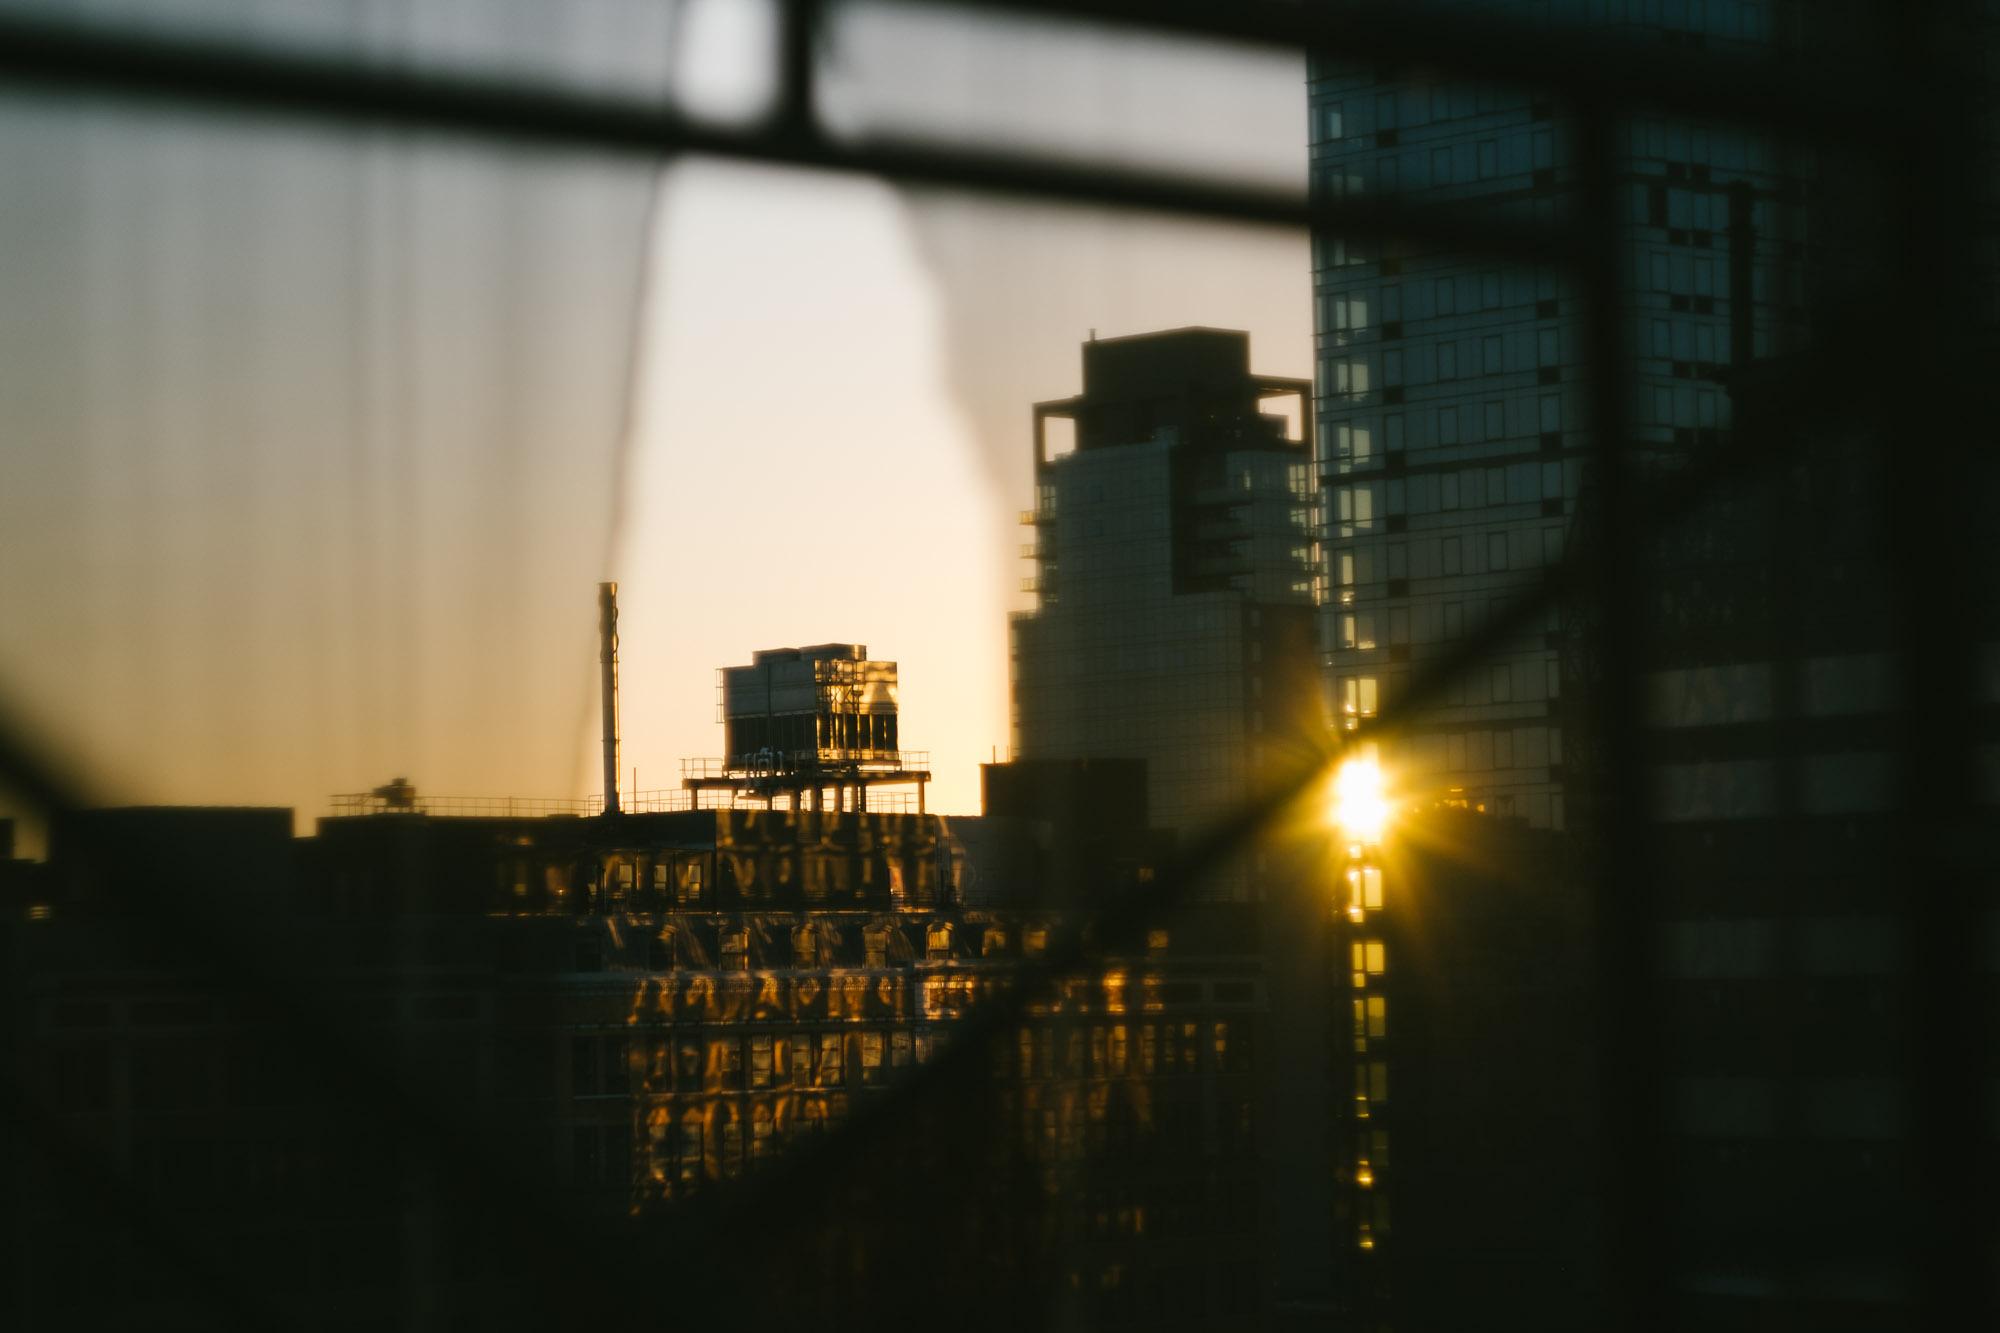 Sunset in Midtown. Fuji X-Pro 1, Helios 44-4